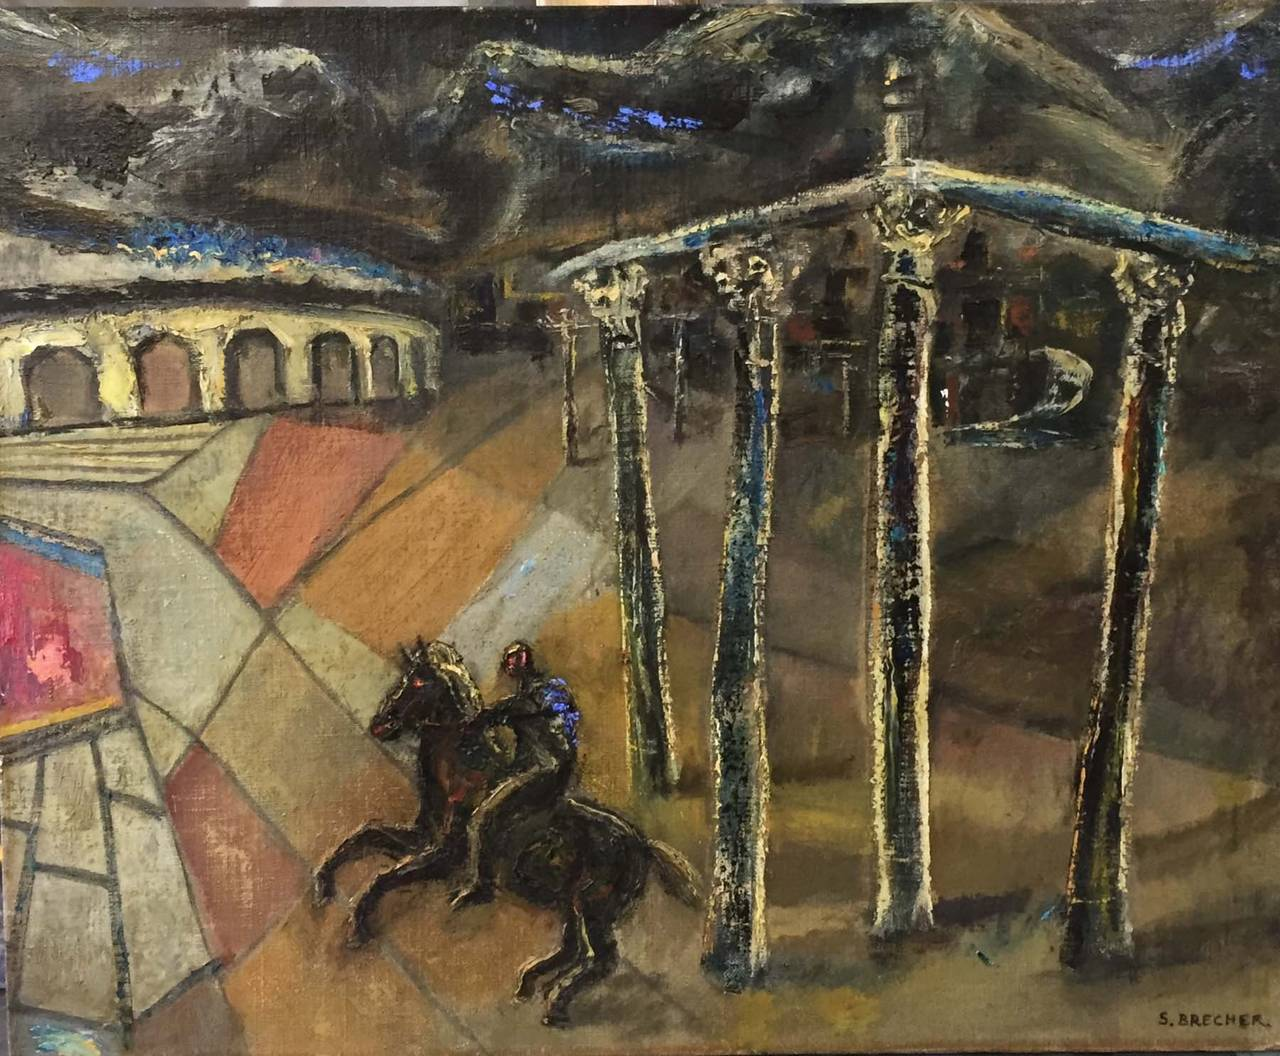 Samuel Brecher Landscape Painting - RUINS OF POMPAII